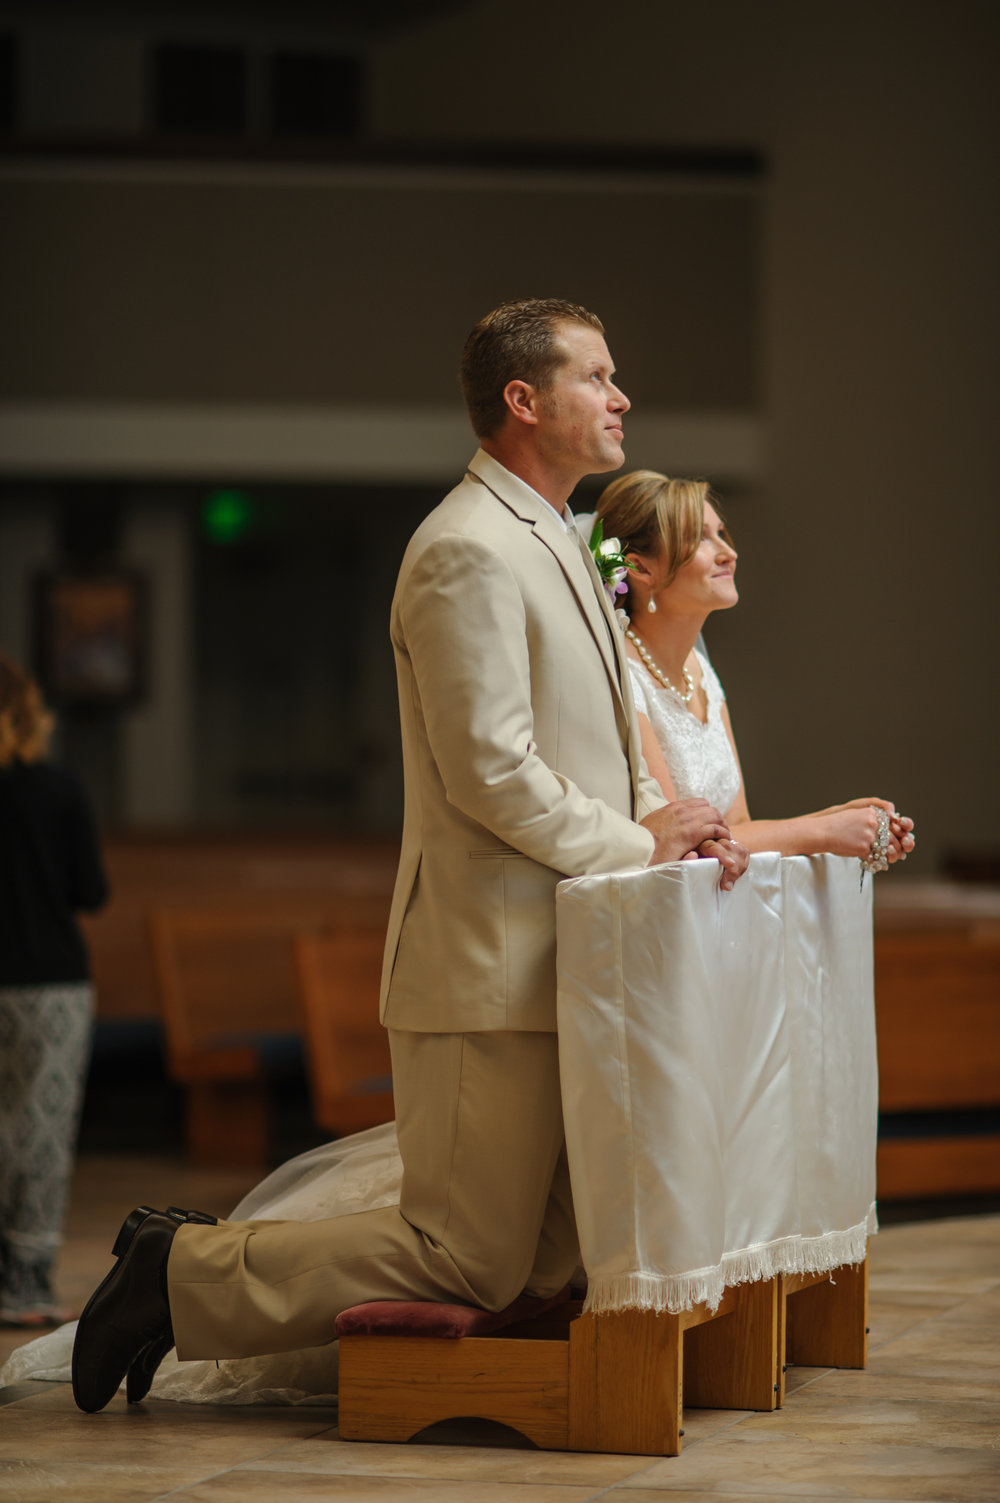 danielle-ross-010-sacramento-wedding-photographer-katherine-nicole-photography.JPG